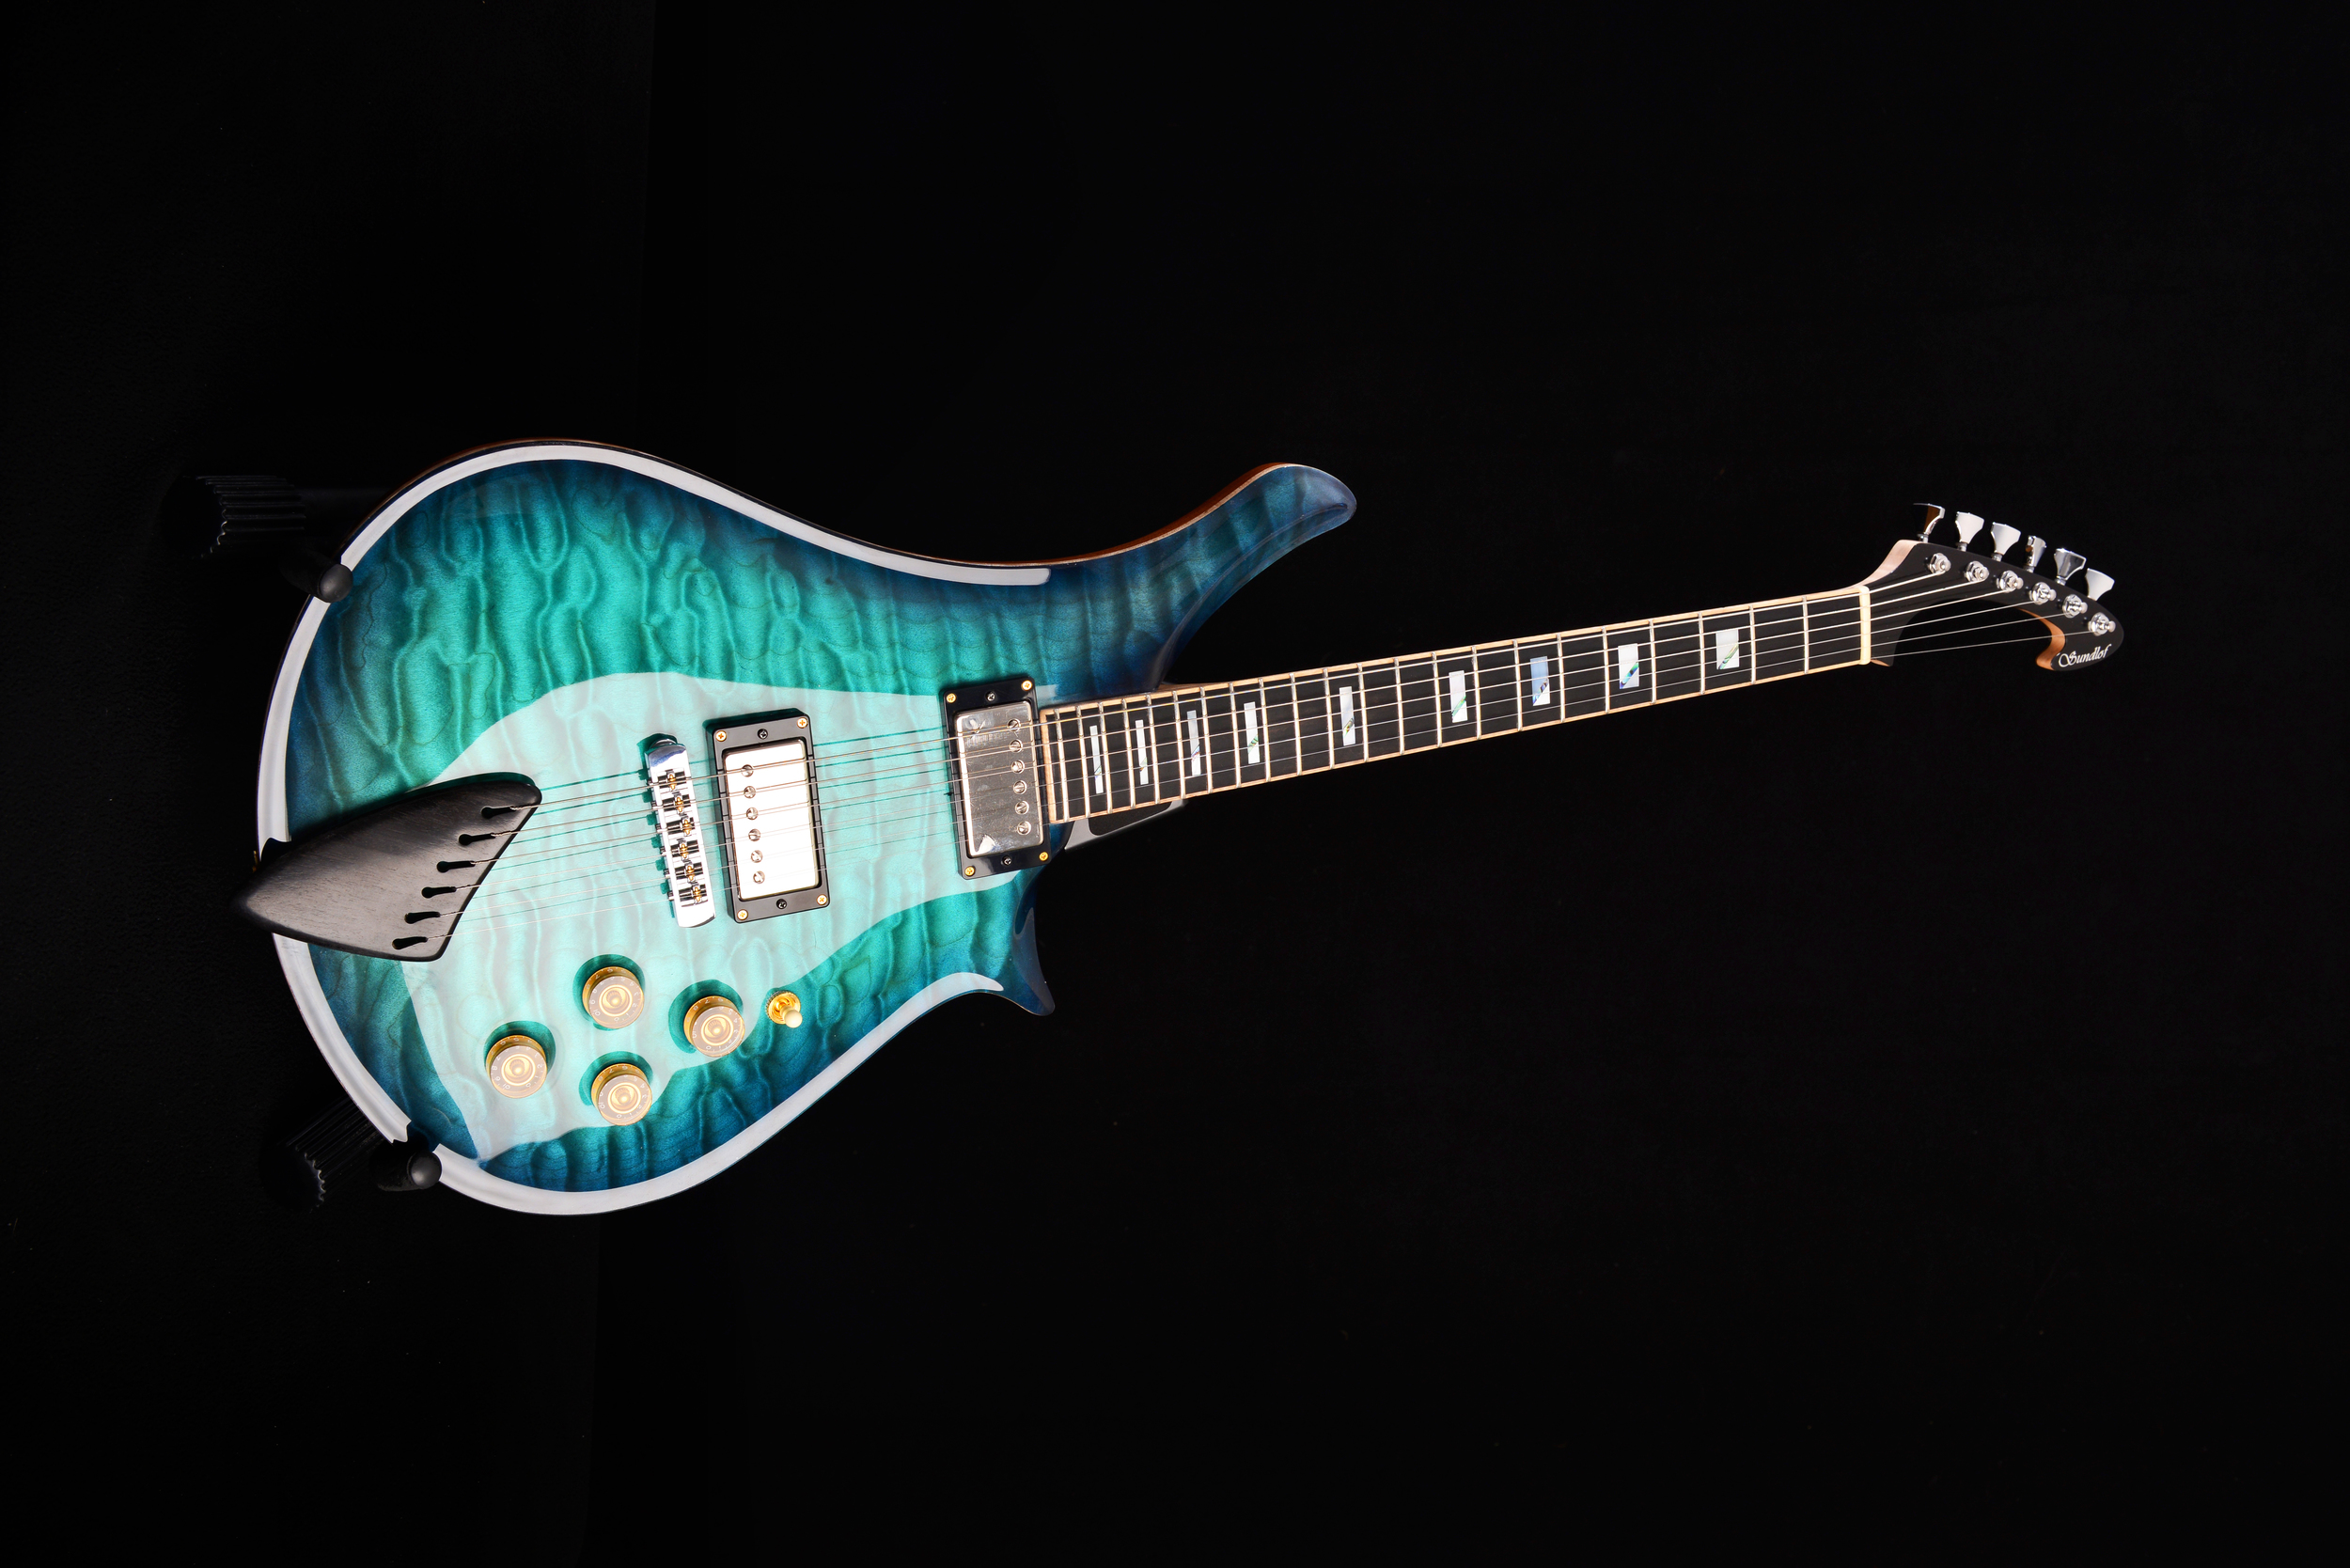 2013-03-18-guitar-024.jpg